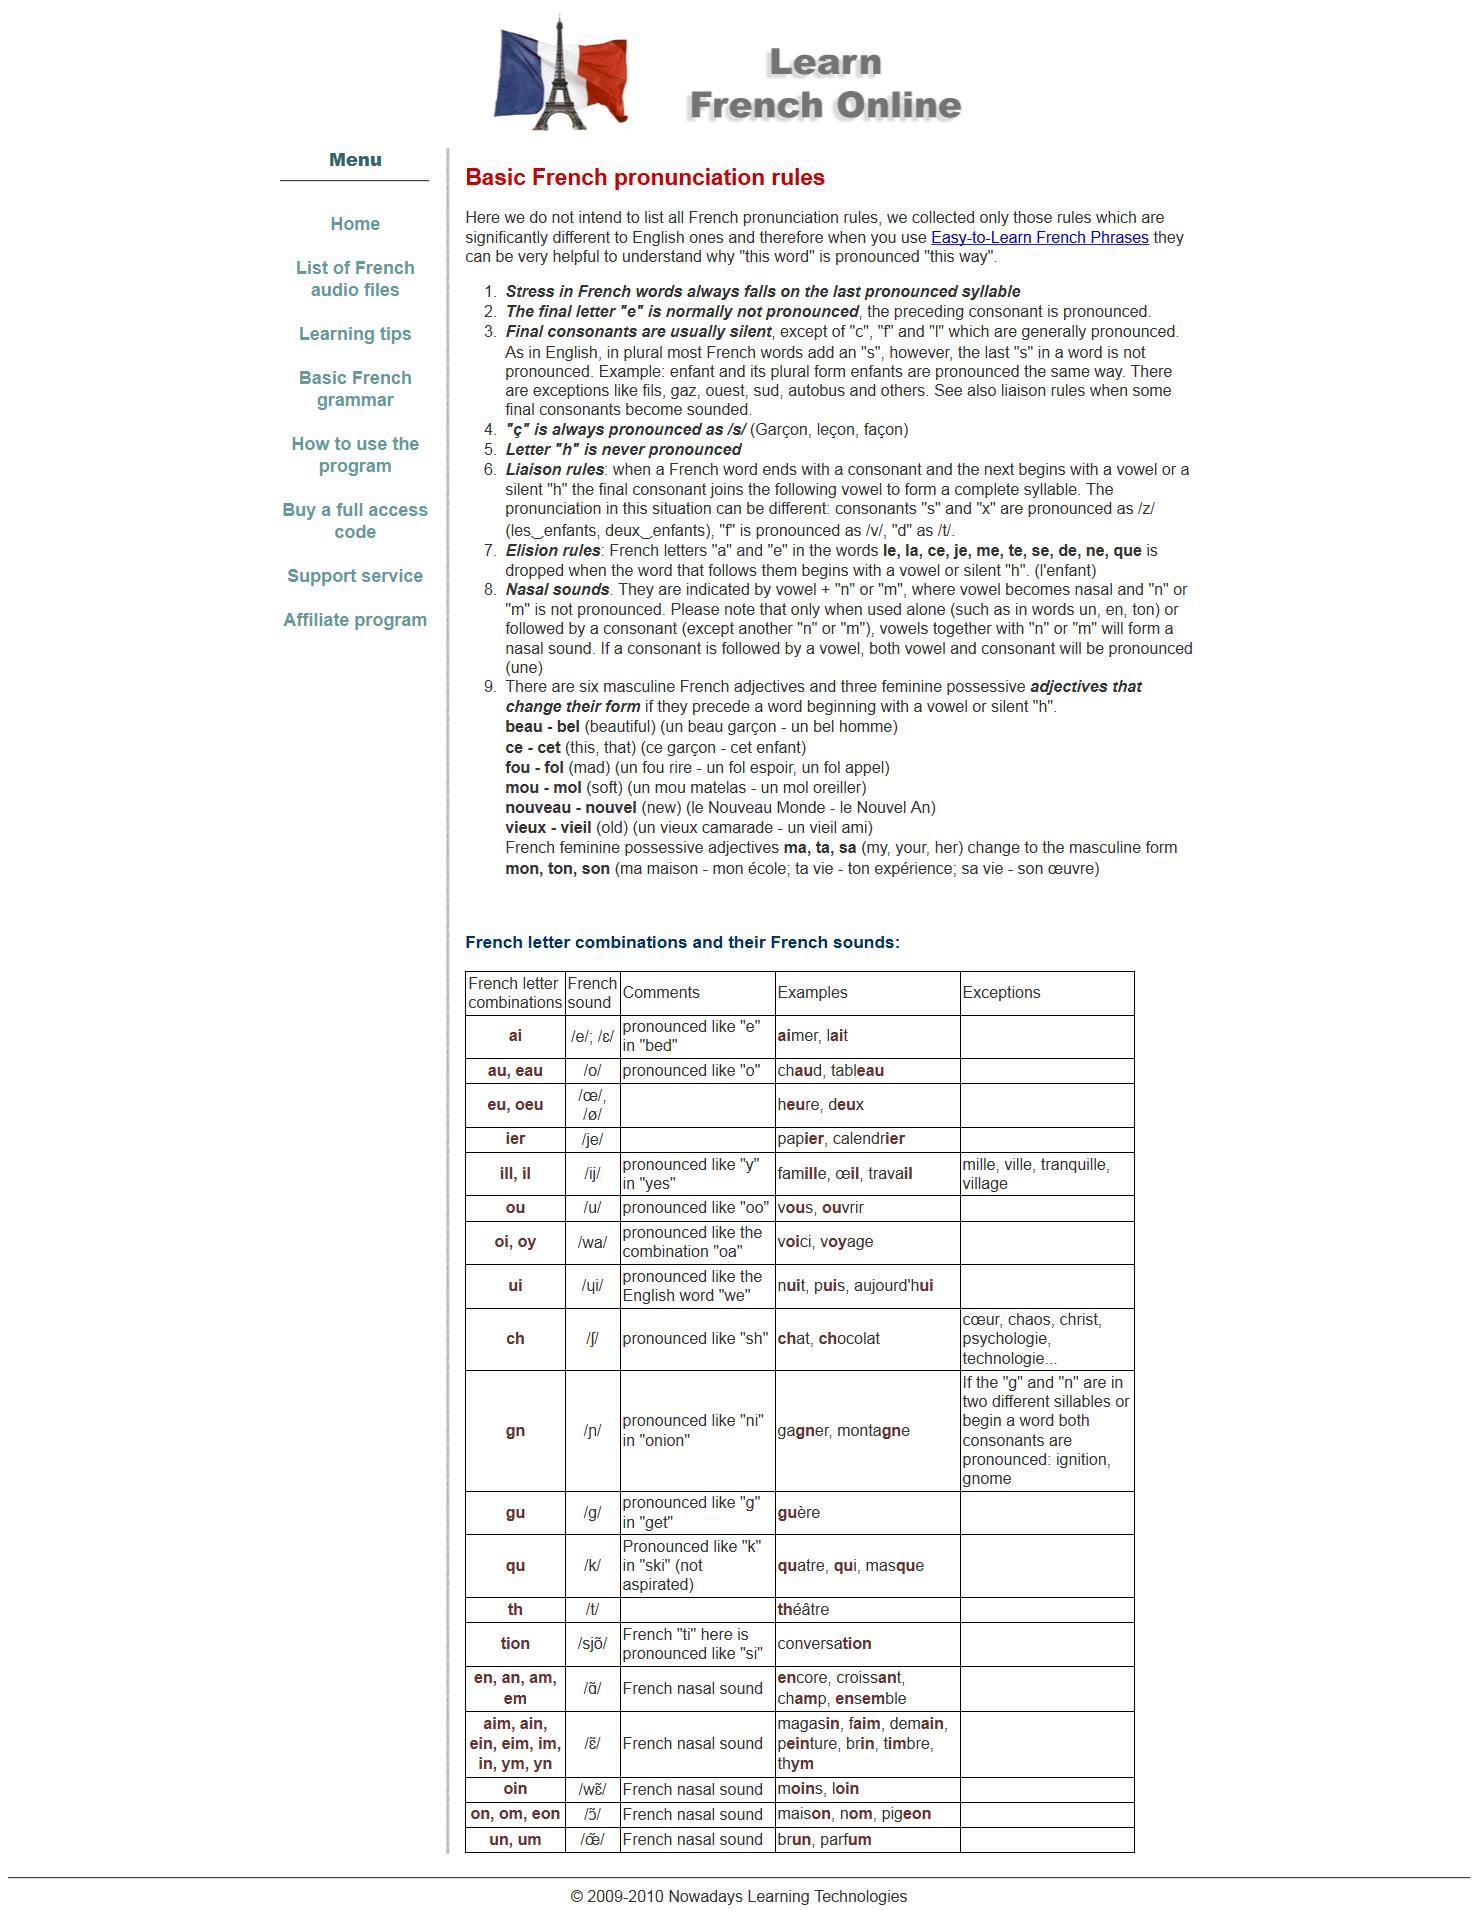 Basic French Pronunciation Rules